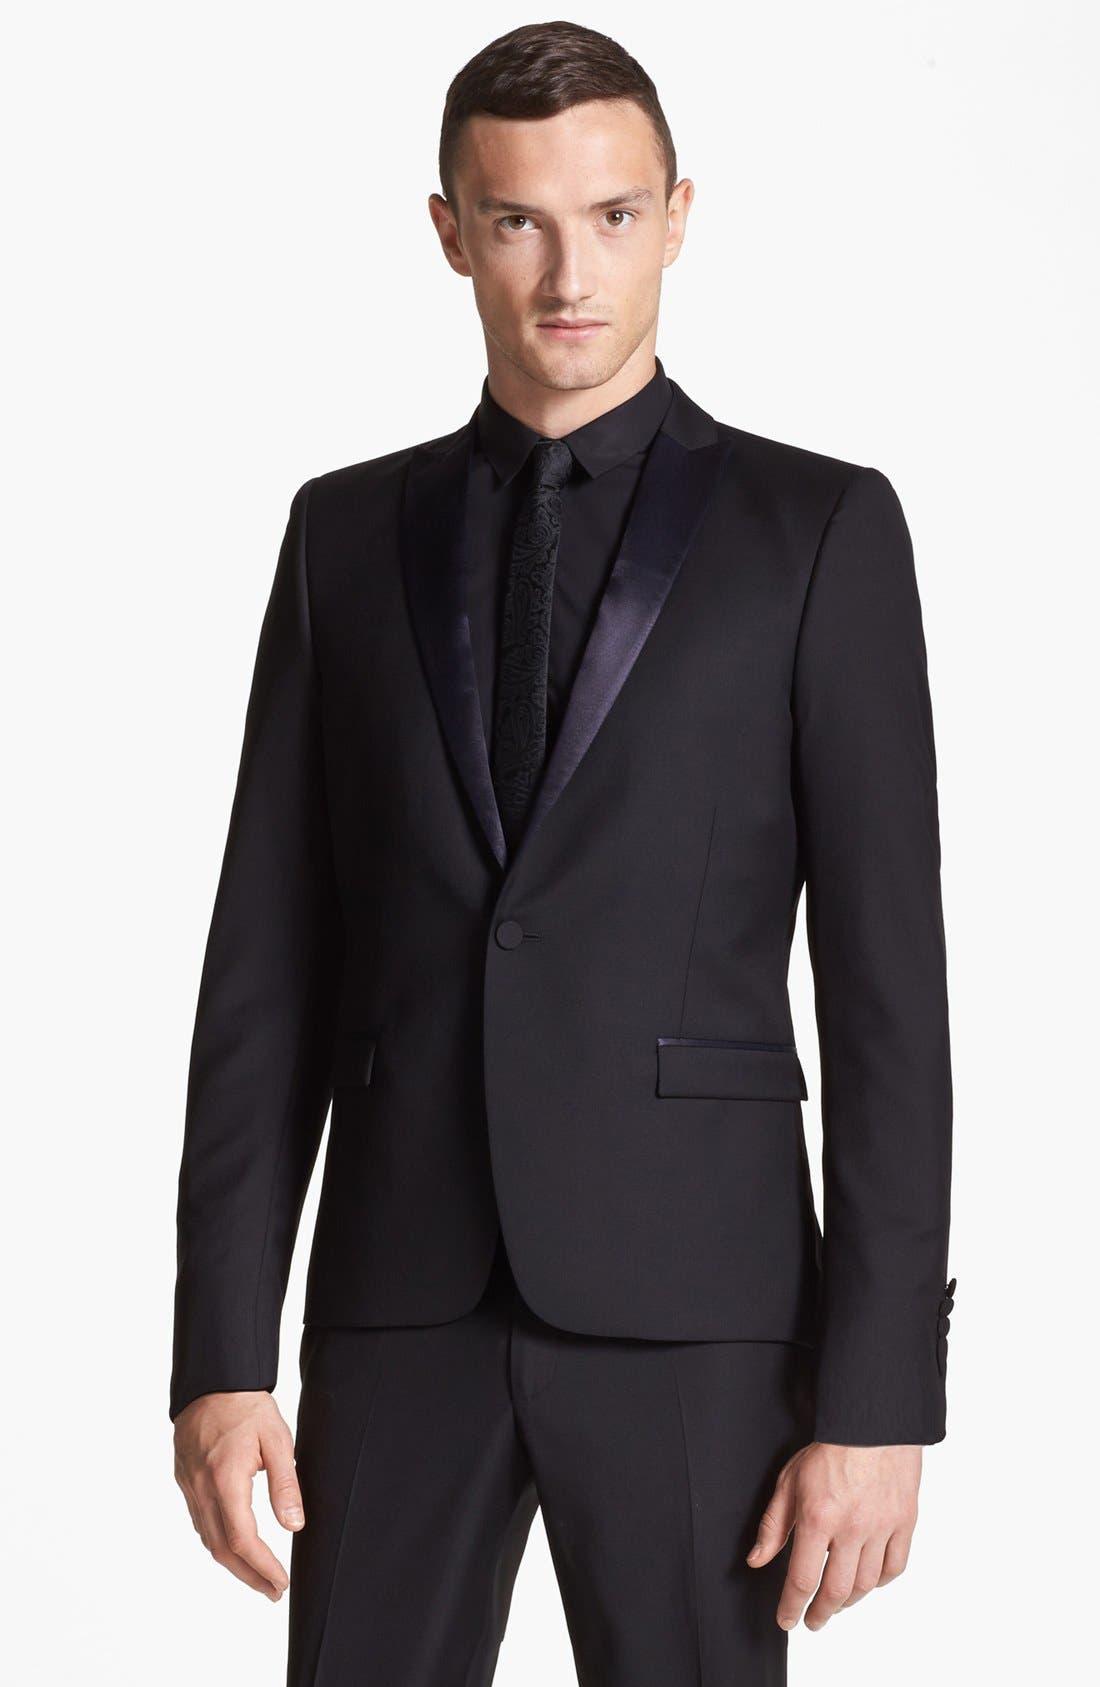 Main Image - The Kooples Trim Fit Black Wool Tuxedo Jacket